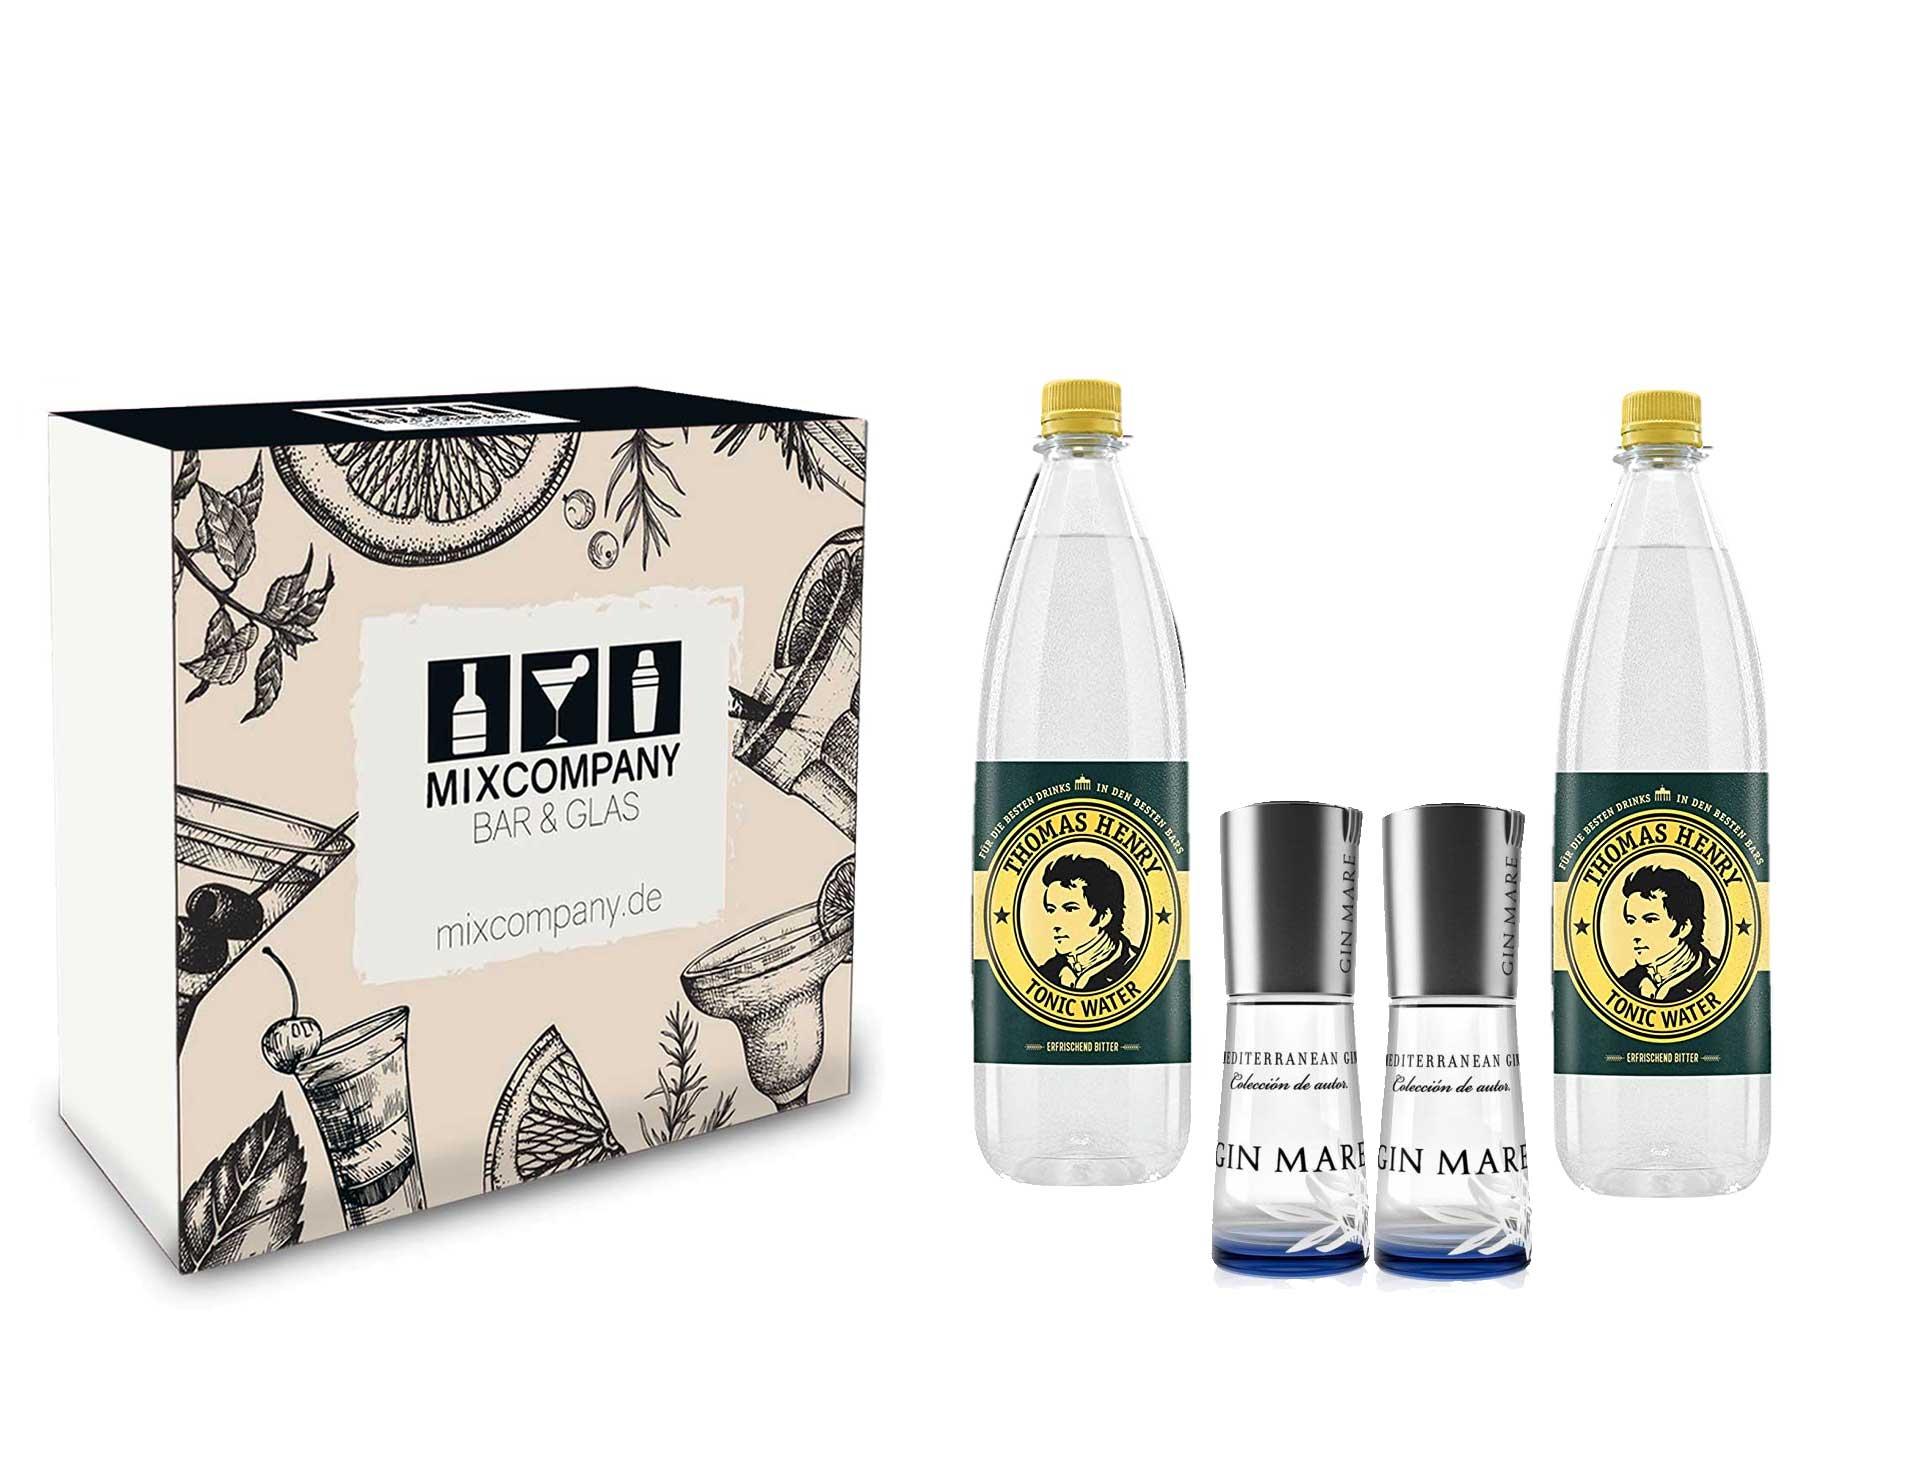 Gin Mare Gin tonic Set / Geschenkset - 2x Gin Mare Mediterranean Miniatur 100ml (42,7% vol ) + 2x Thomas Henry Tonic Water 1000ml - Inkl. Pfand MEHRWEG